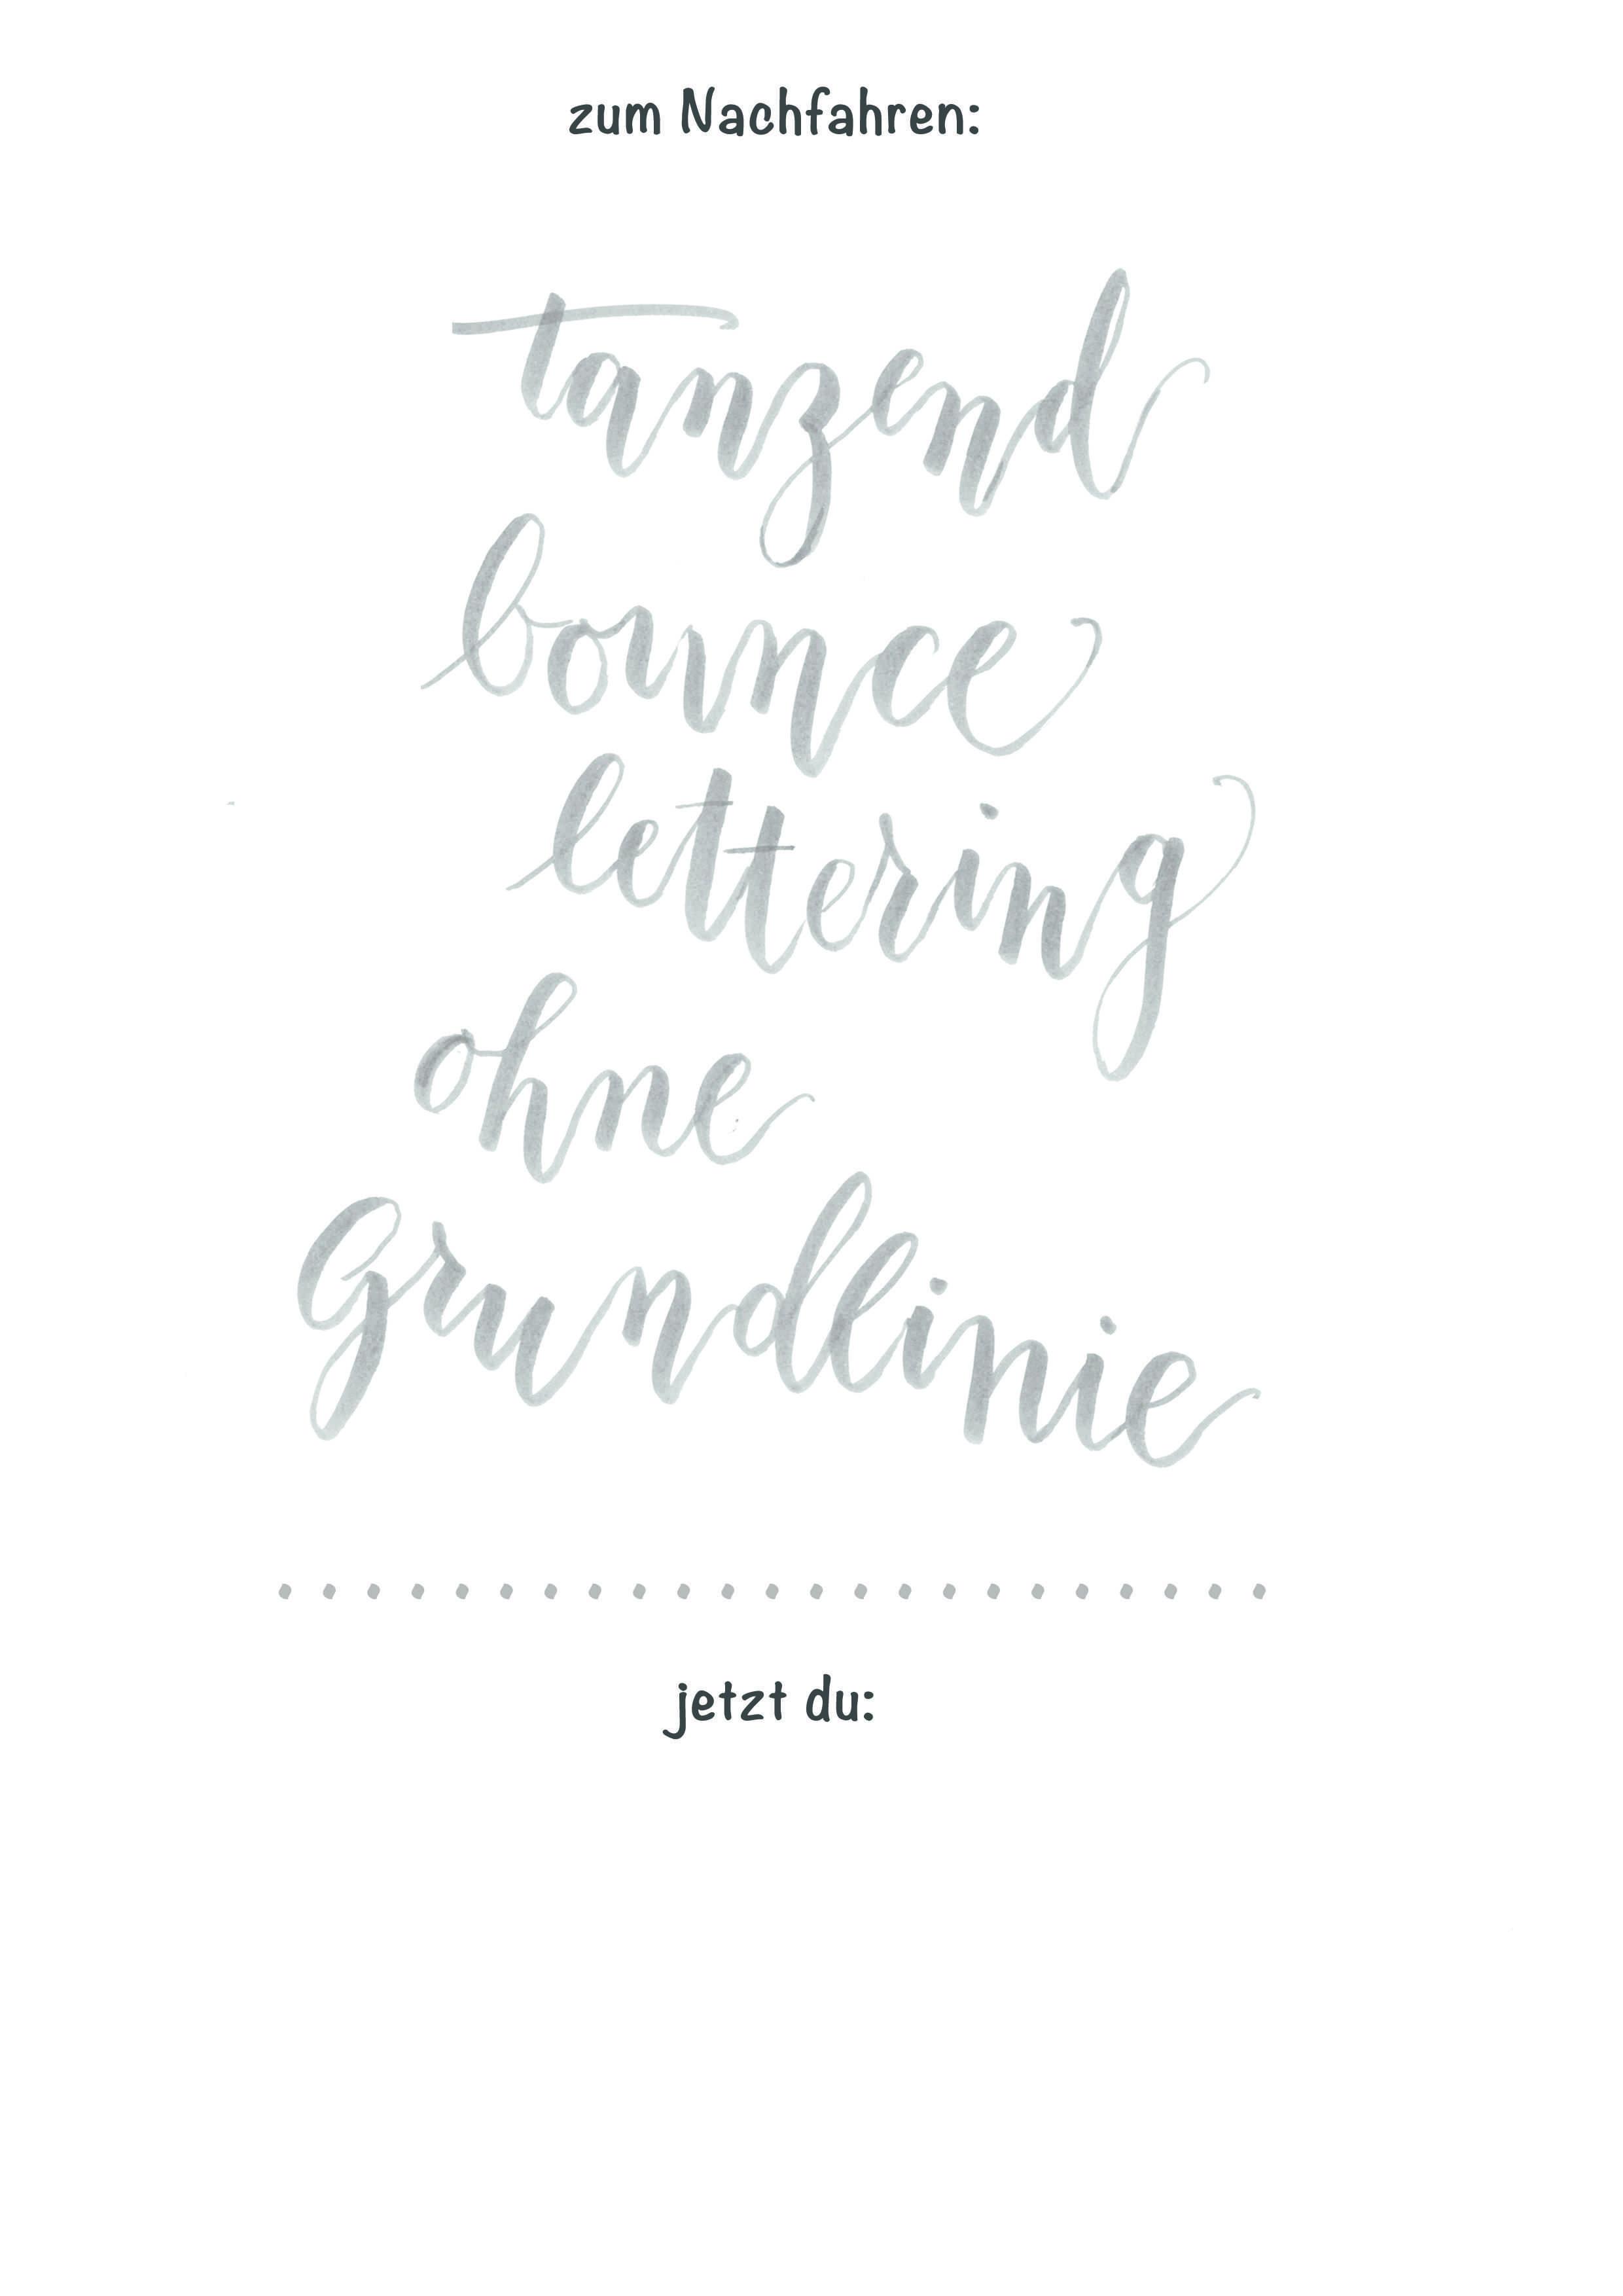 Lettering Vorlage Handlettering Ubungsblatt Ausdrucken Lettering